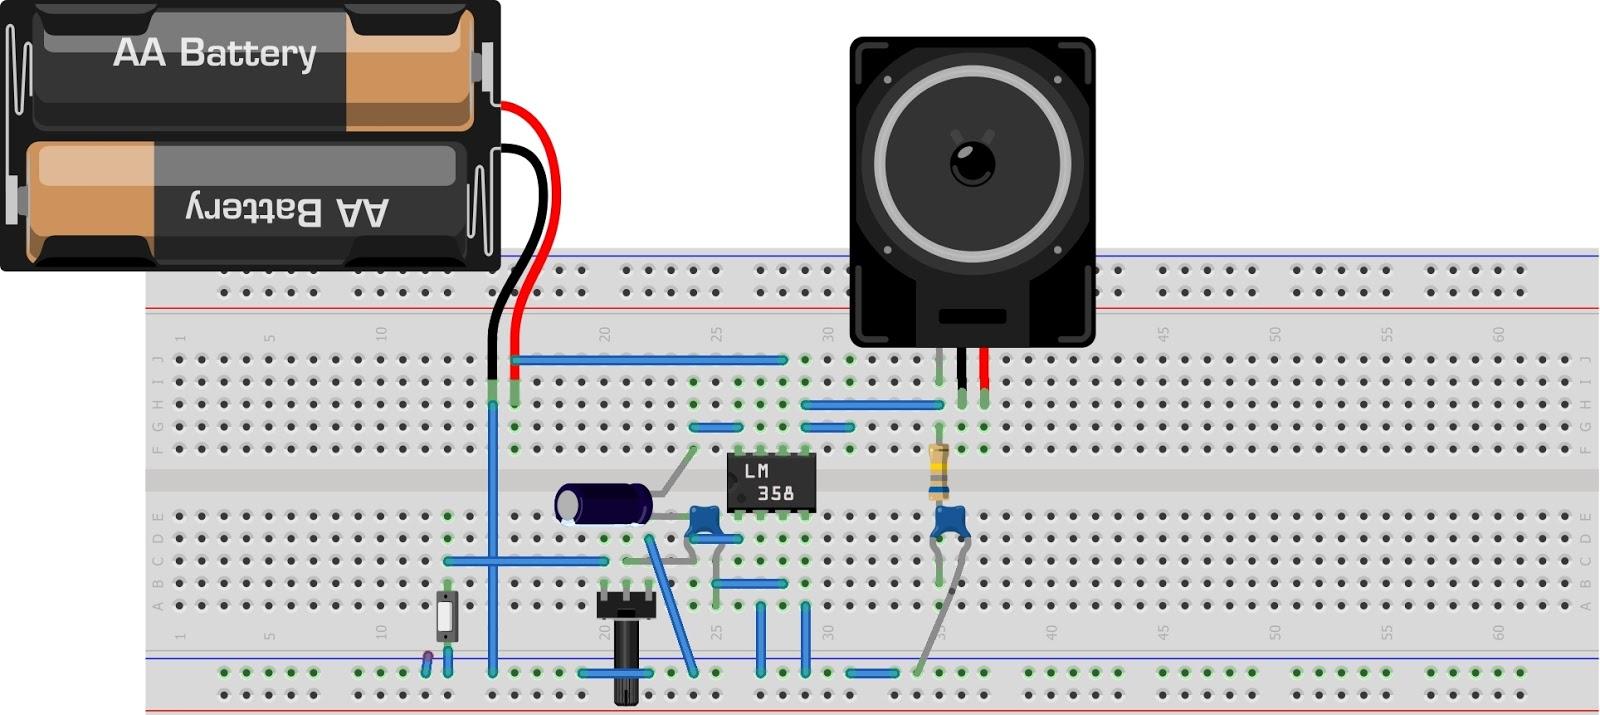 Audio Amp Schematic Breadboard Modern Design Of Wiring Diagram Lm386 Amplifier Circuit Sam Technology Professionals July 2013 Rh Samtechpro Blogspot Com Simple C2500 Ampwith